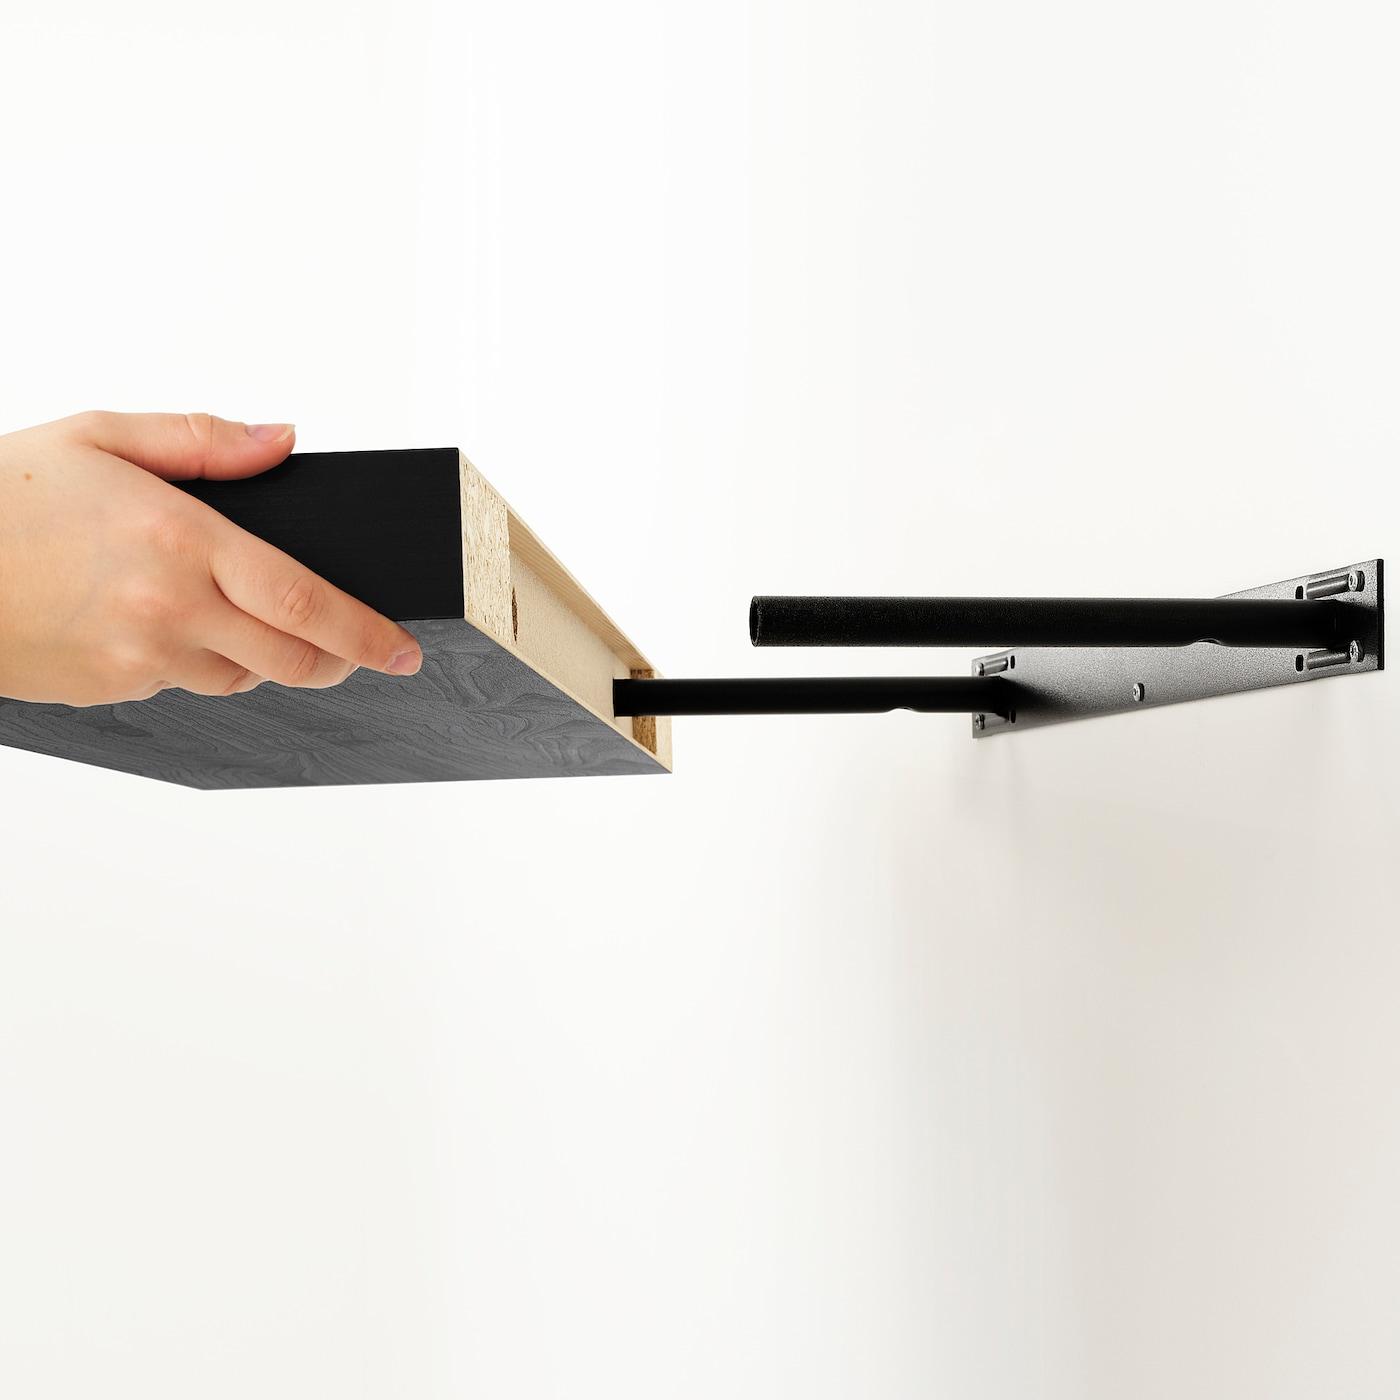 Lack Wandplank Zwartbruin 110x26 Cm Ikea